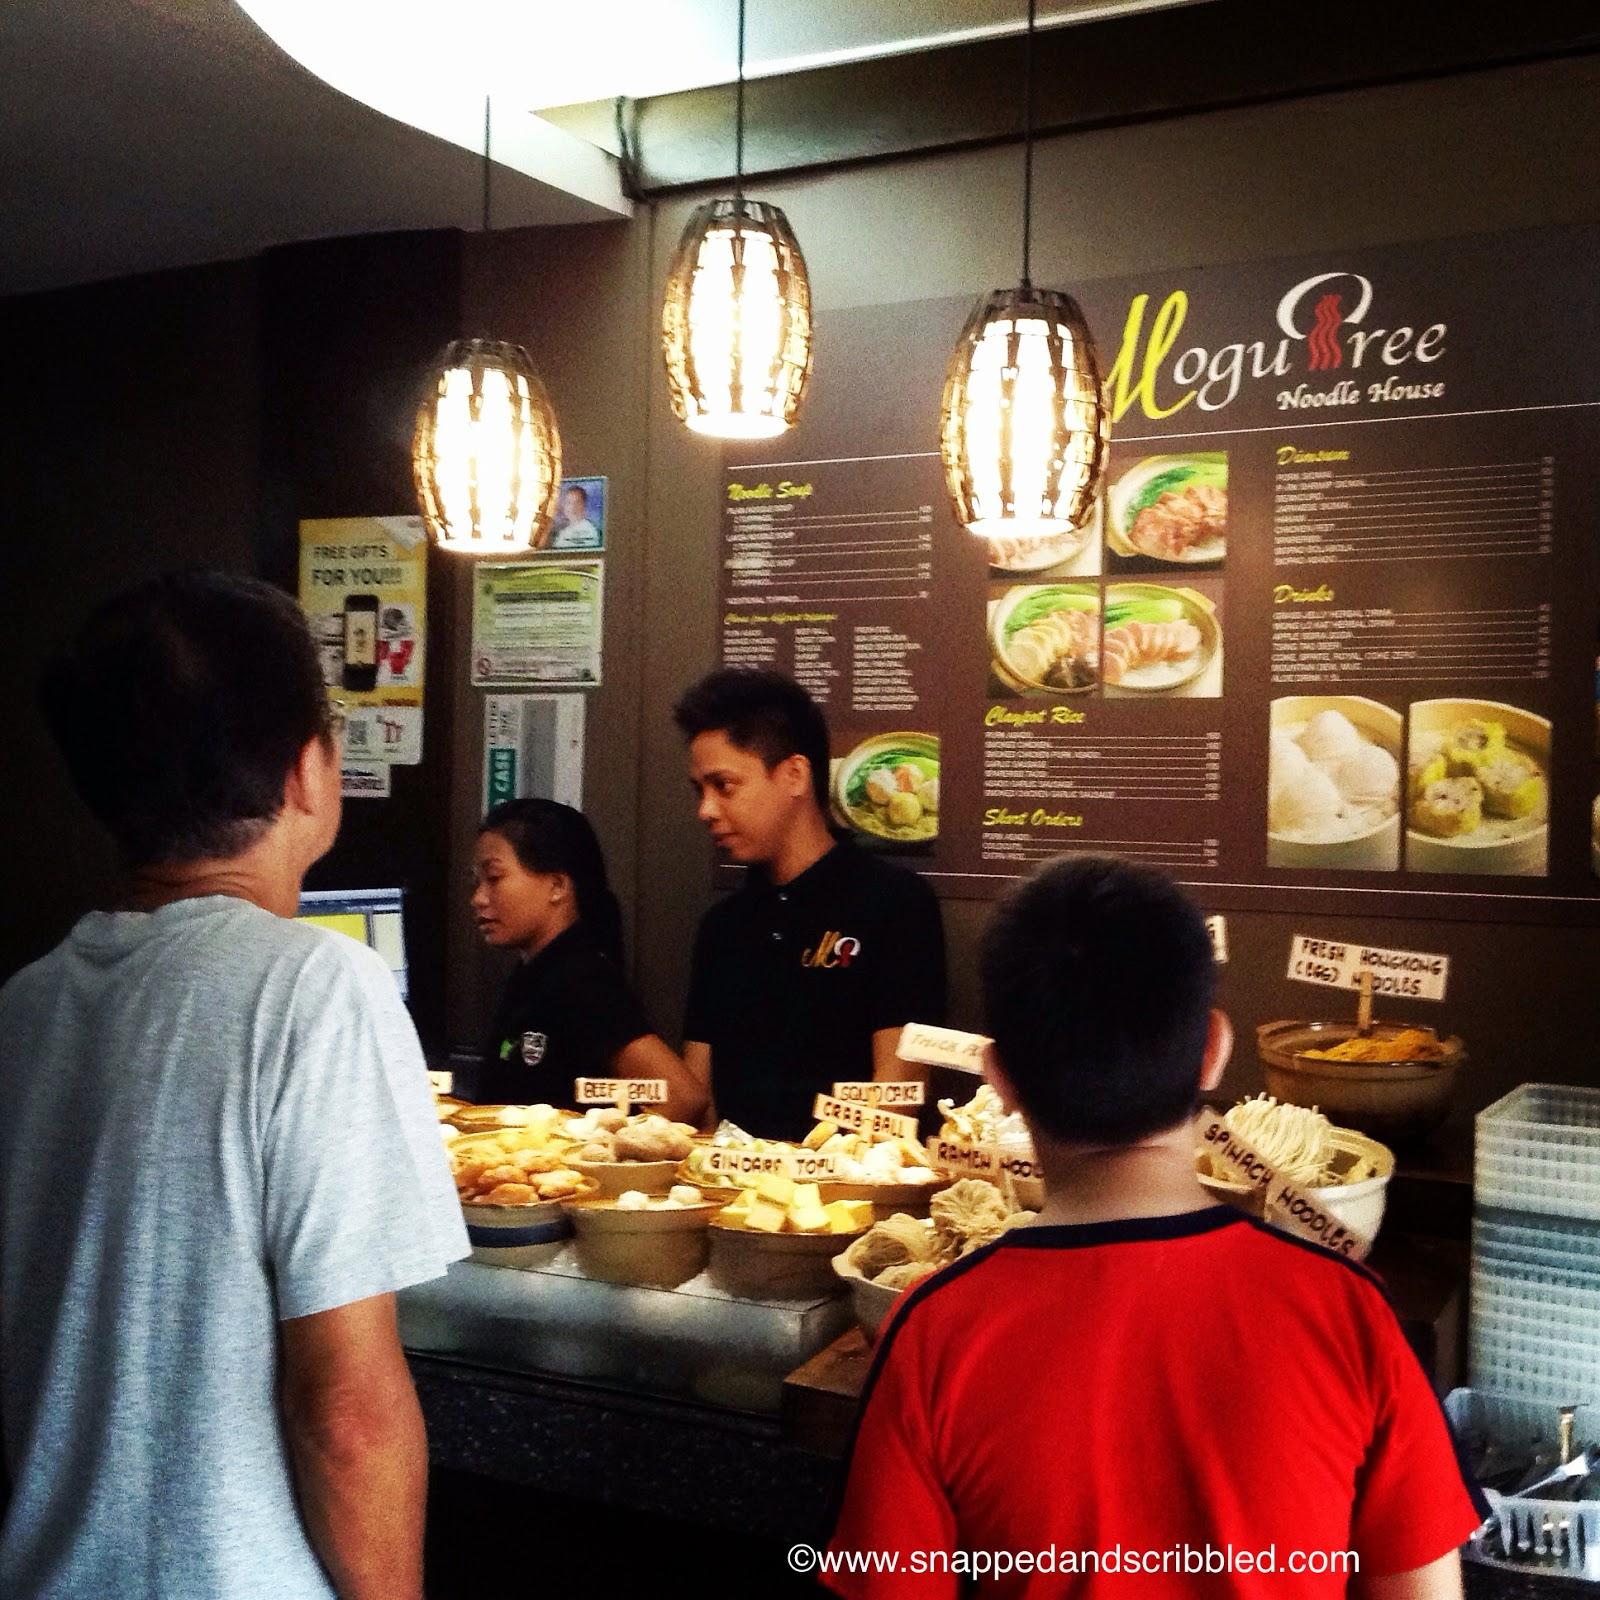 Where To Eat in Marikina: Mogu Tree Noodle House